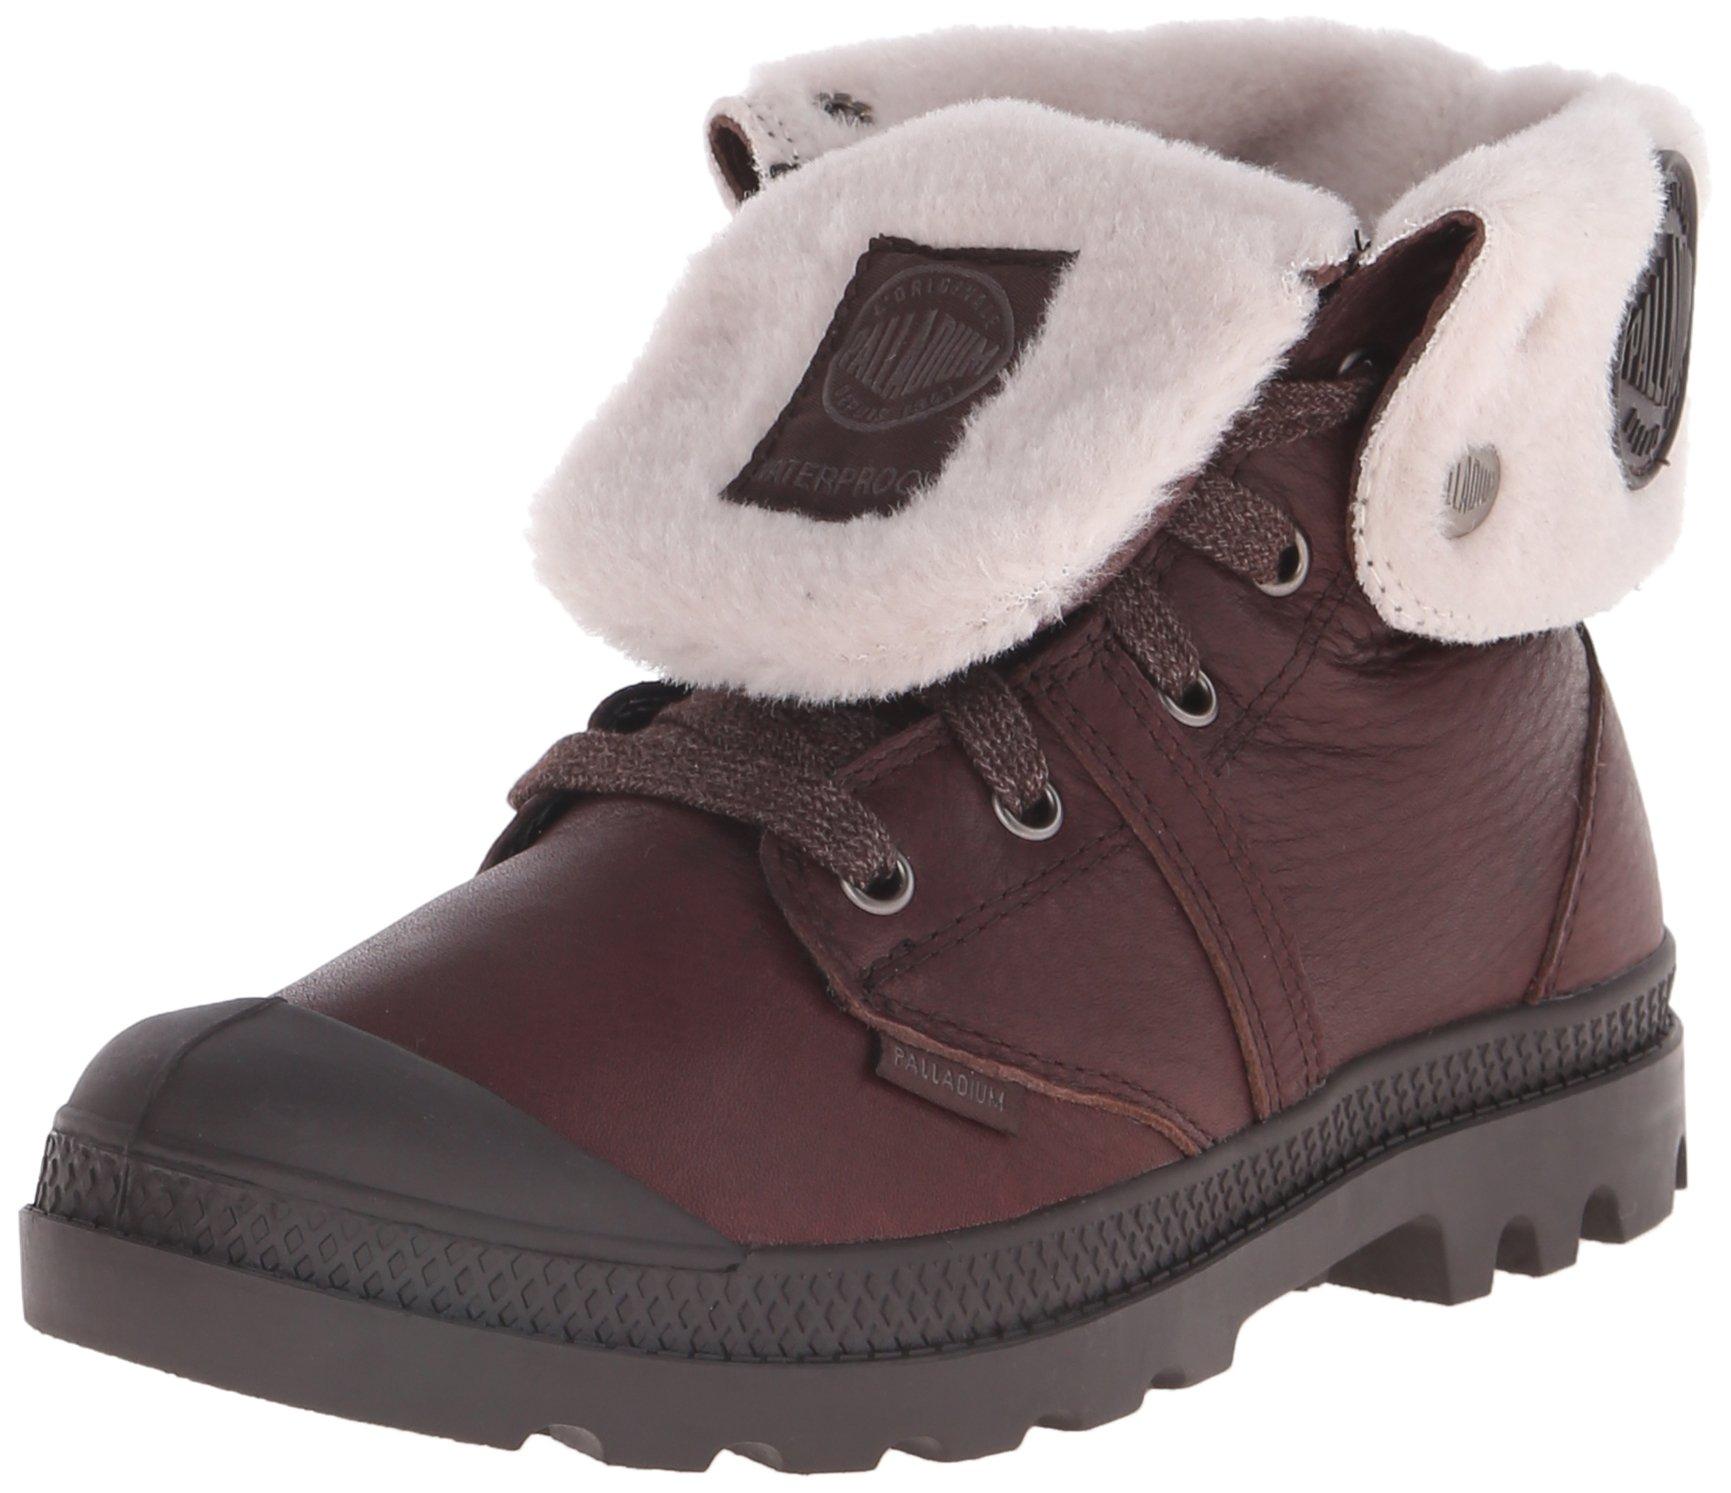 Palladium Women's Pallabrouse Baggy WPS Rain Boot, Chocolate, 8 M US